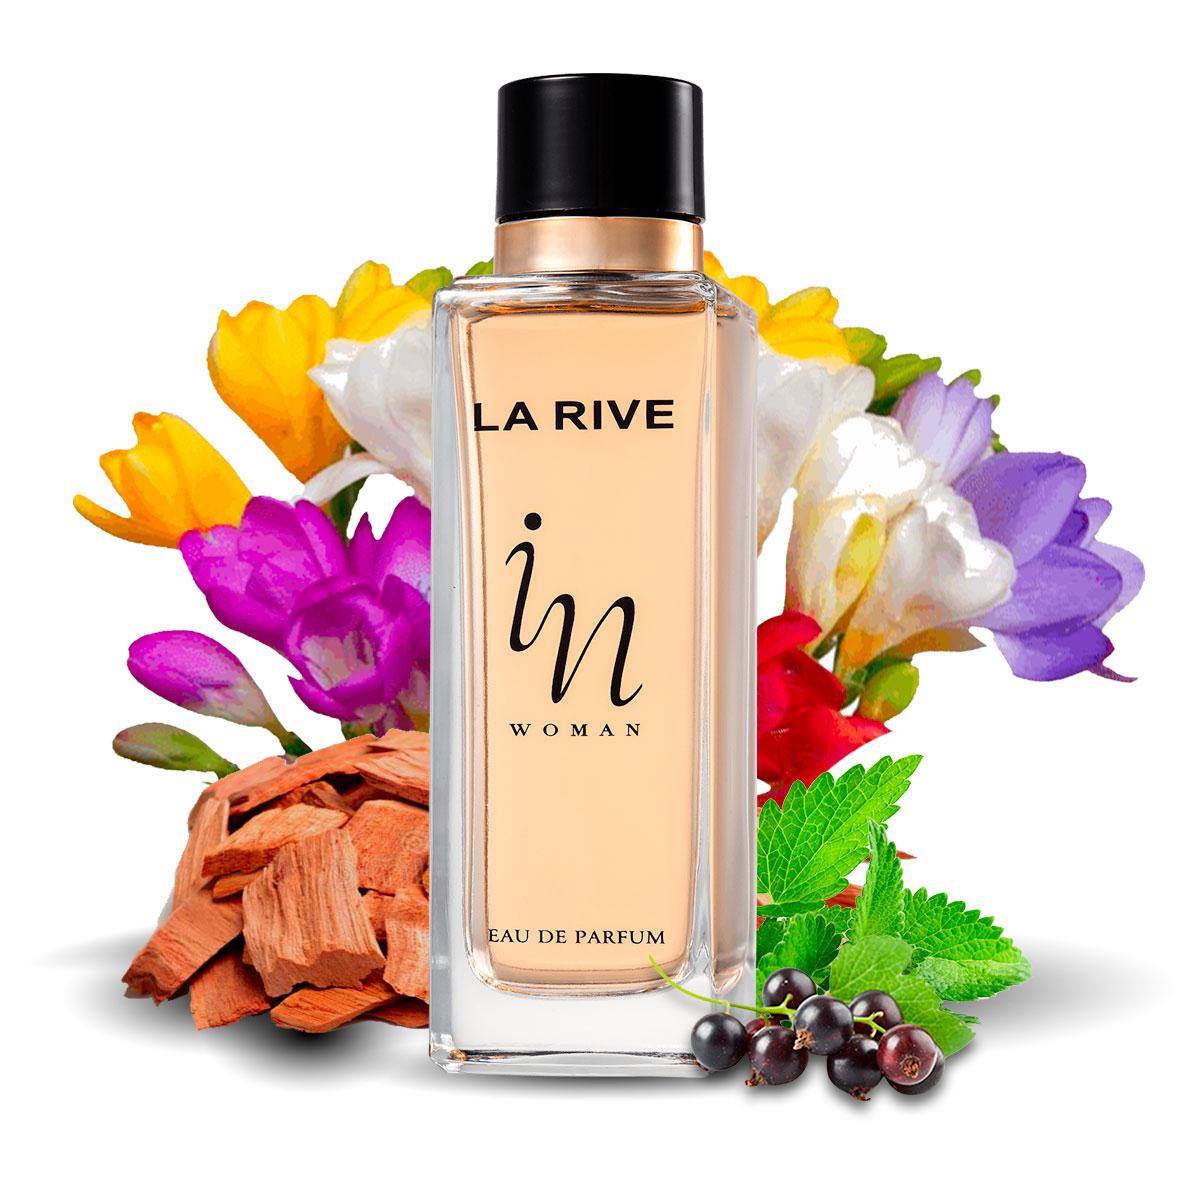 Kit 2 Perfumes Importados In Woman e Steel Essence La Rive